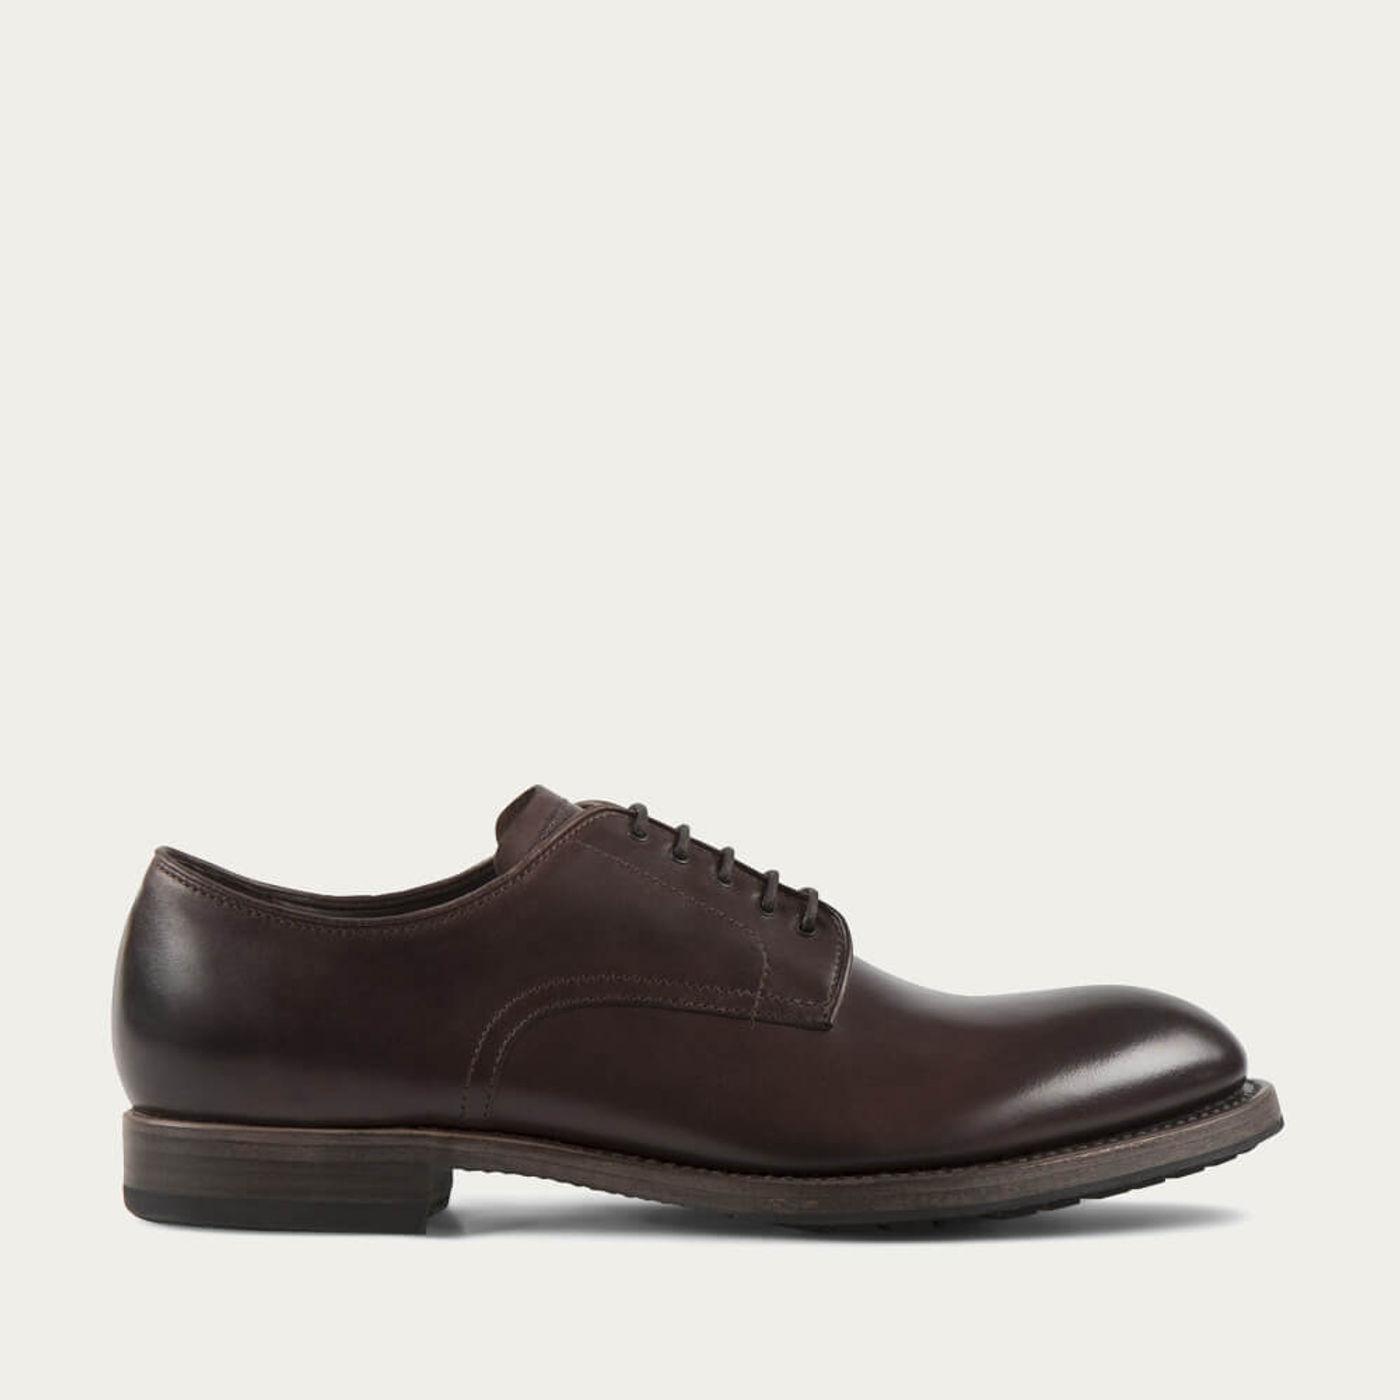 Tmoro Daze Cordovan Leather Shoes   Bombinate